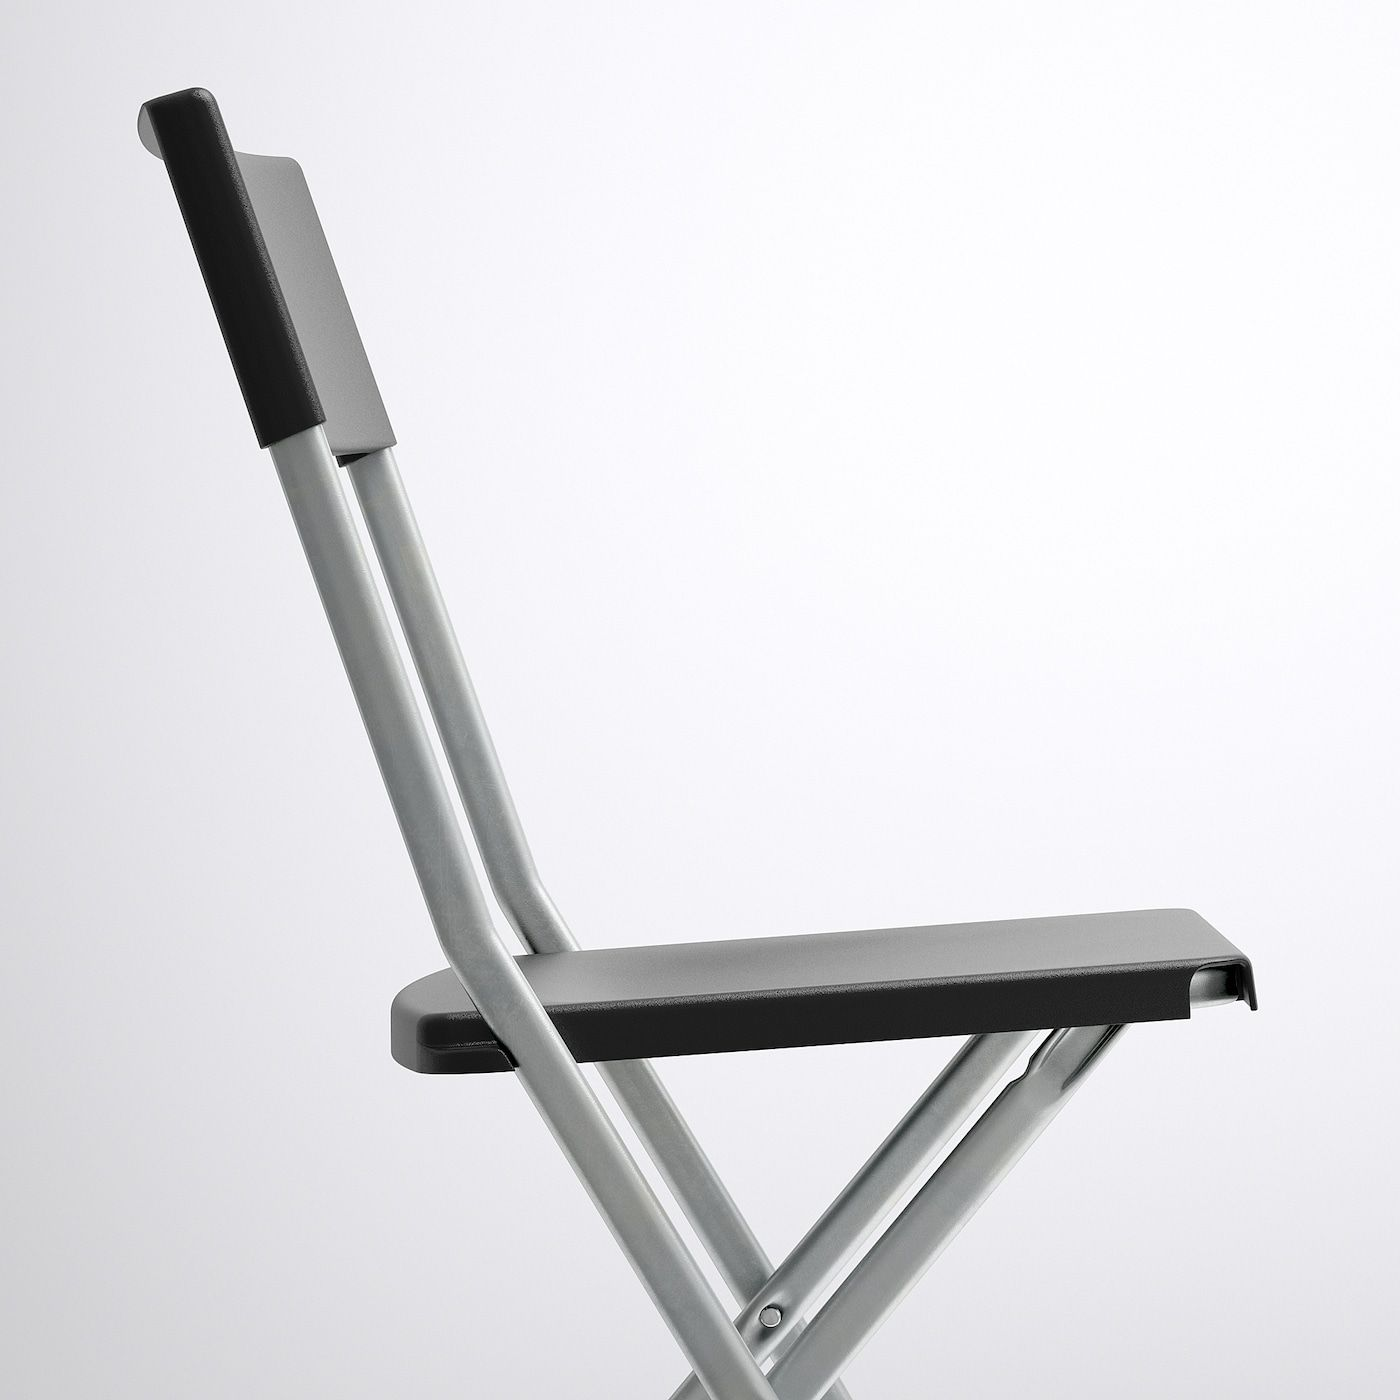 Gunde Folding Chair Black In 2020 Chair Folding Chair Ikea